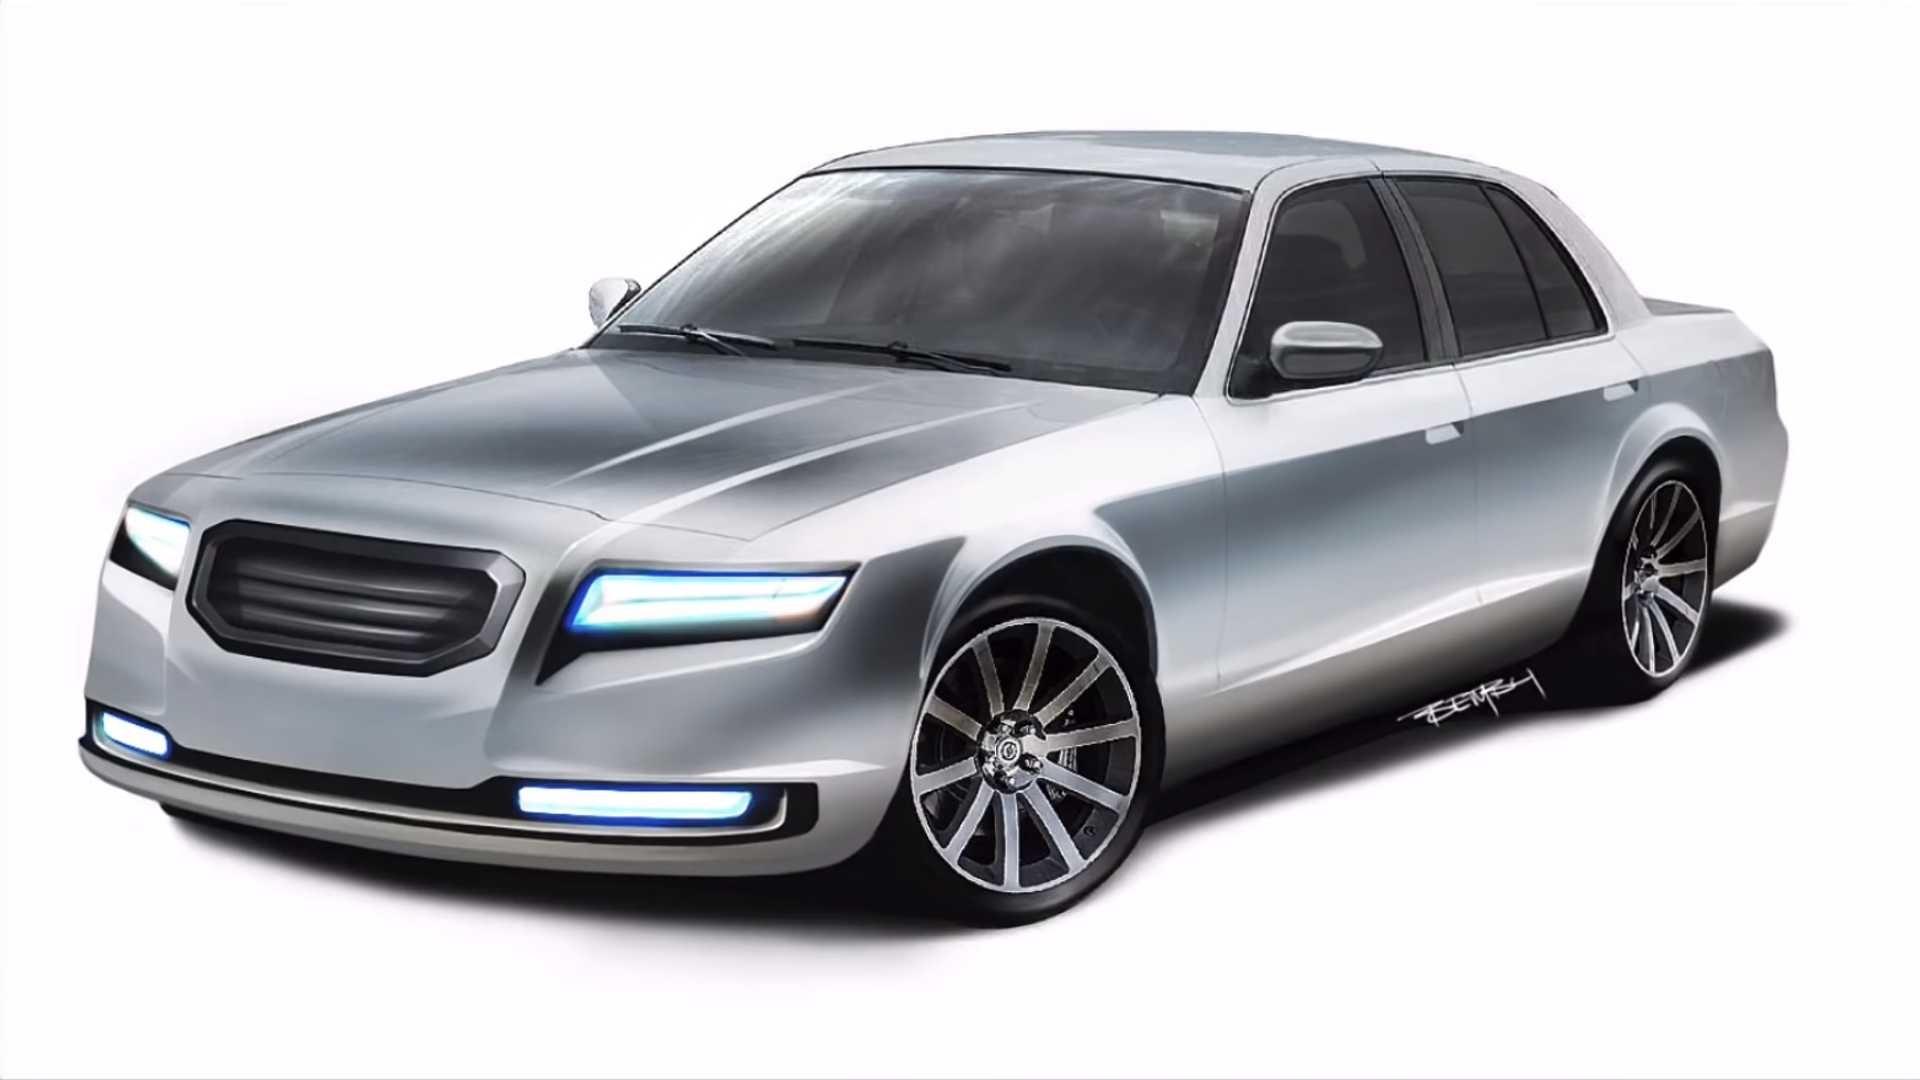 Ford Crown Victoria 2021 Spy Shots